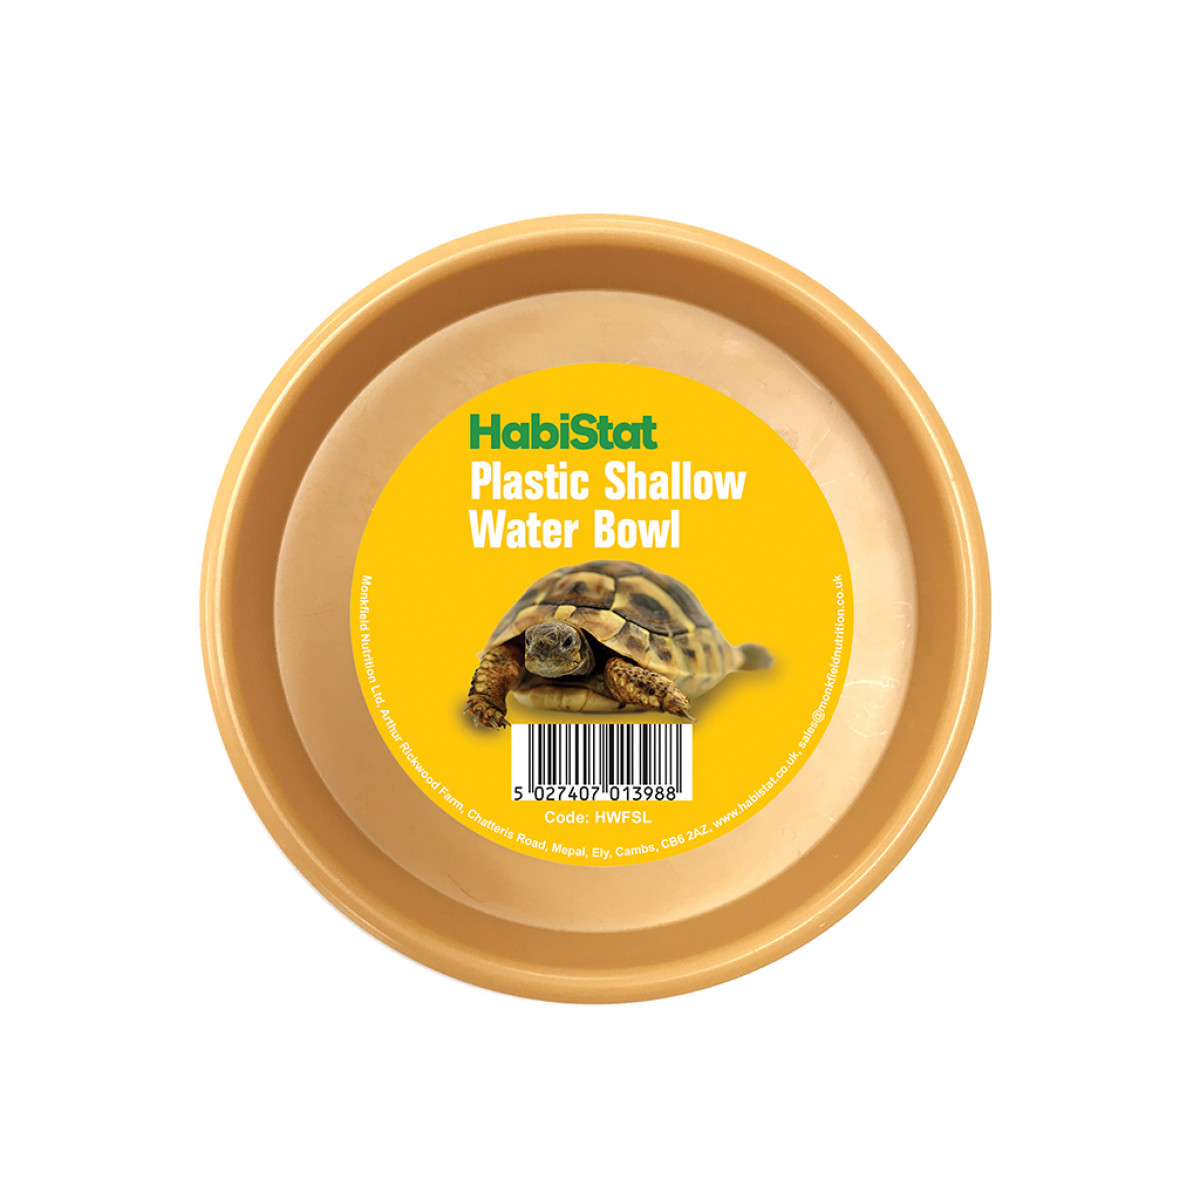 HabiStat Plastic Shallow Tortoise Water Bowl